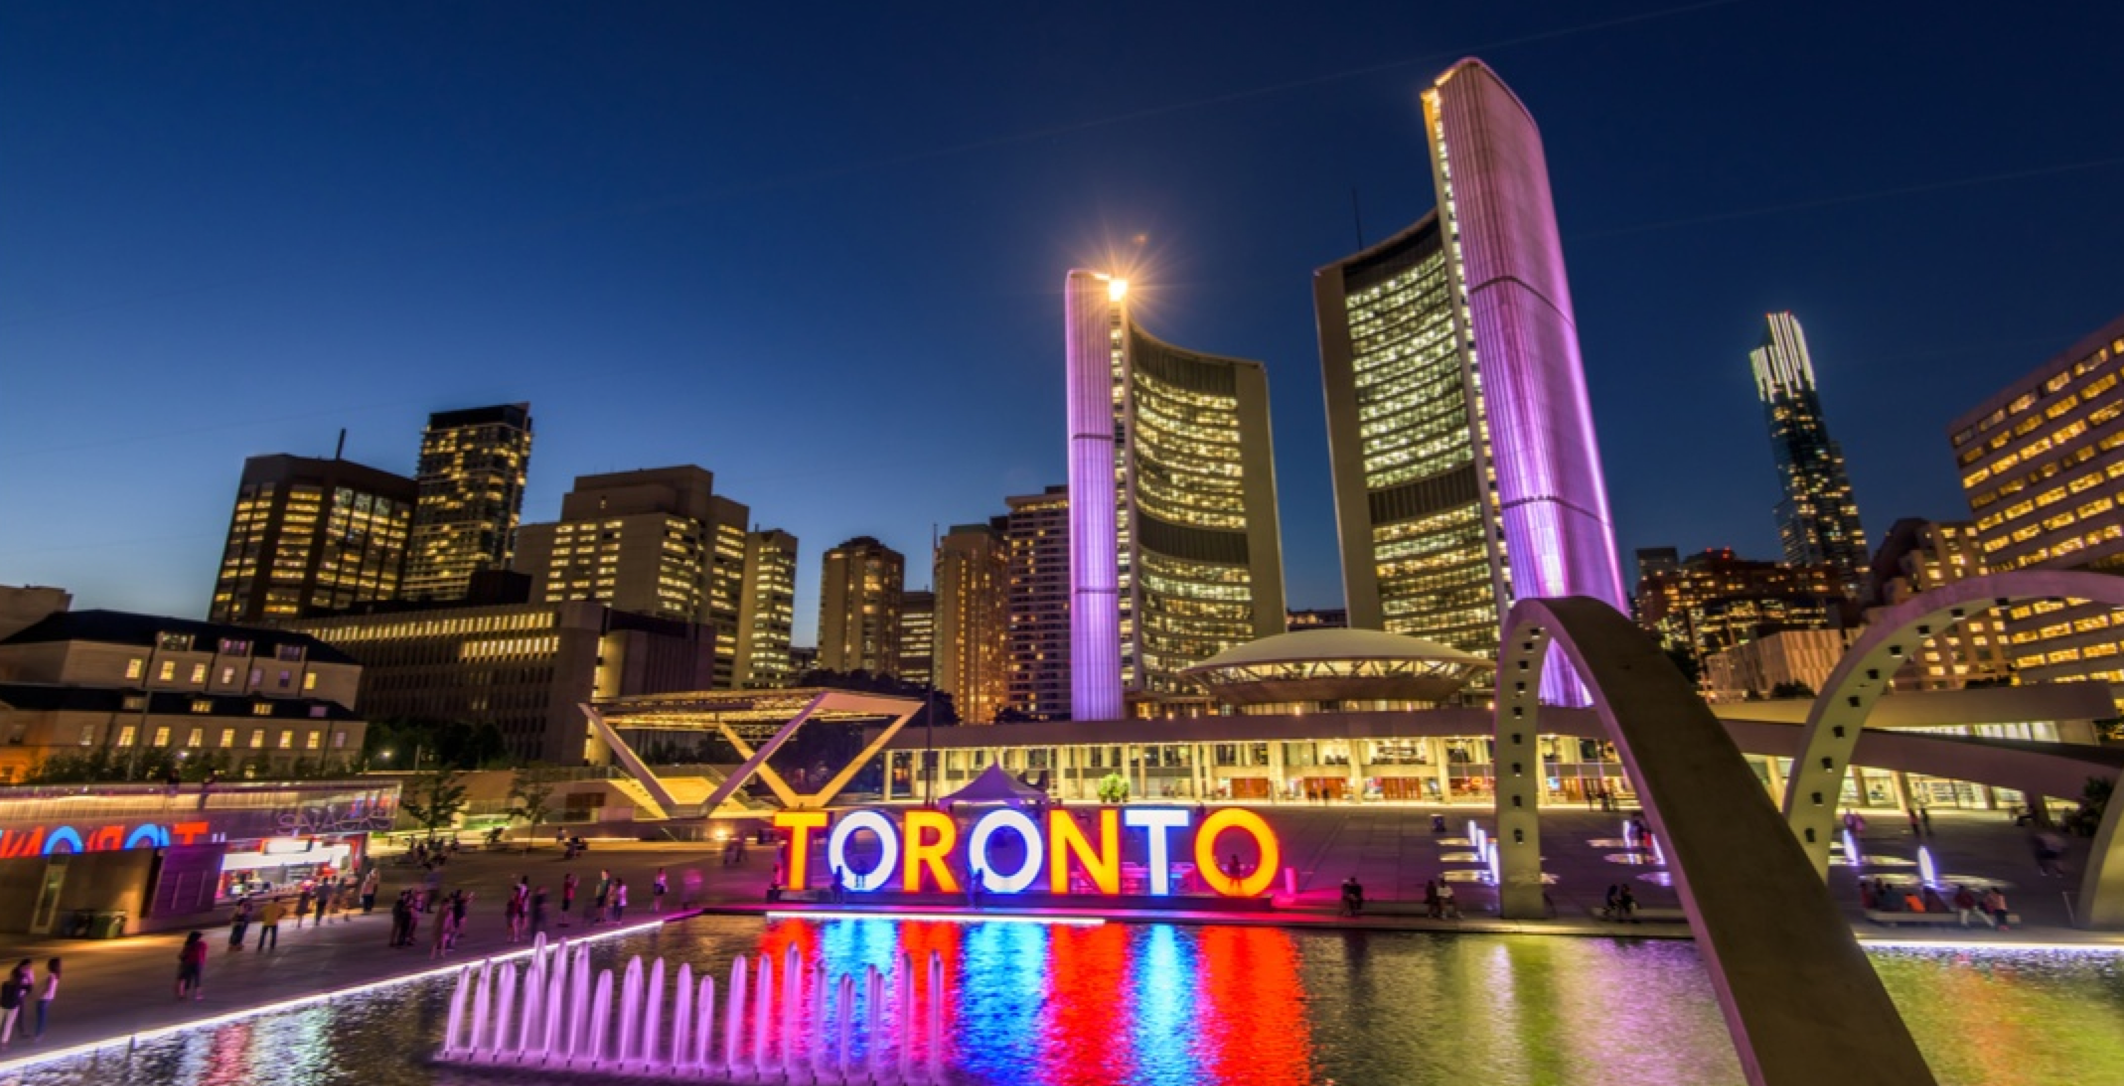 Toronto's UNESCO Bid Accepted